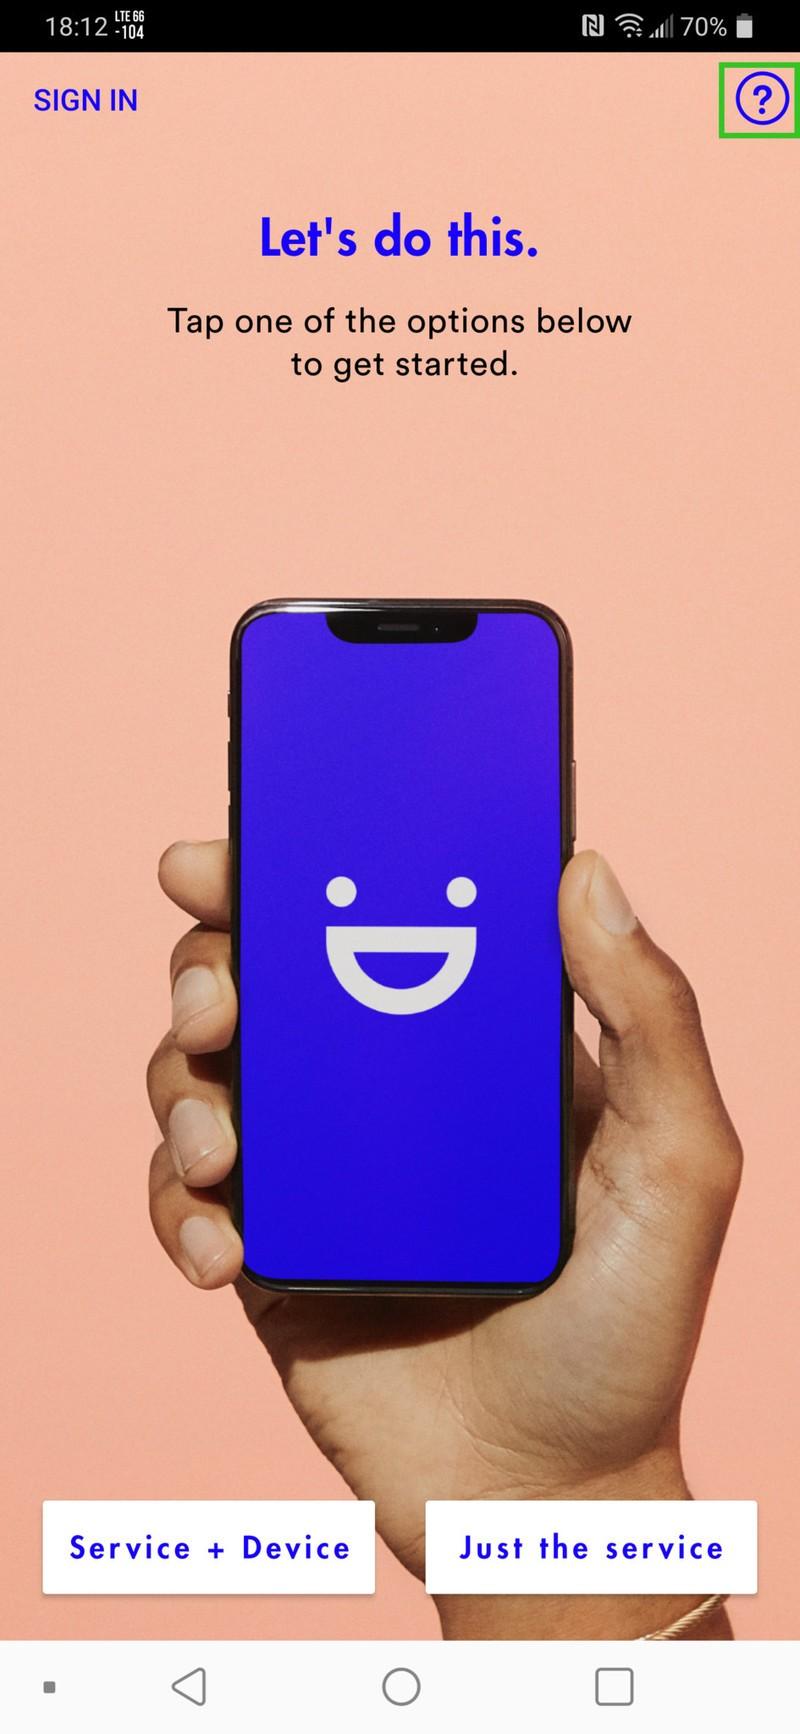 visible-app-contact-1.jpg?itok=CnALWmSJ